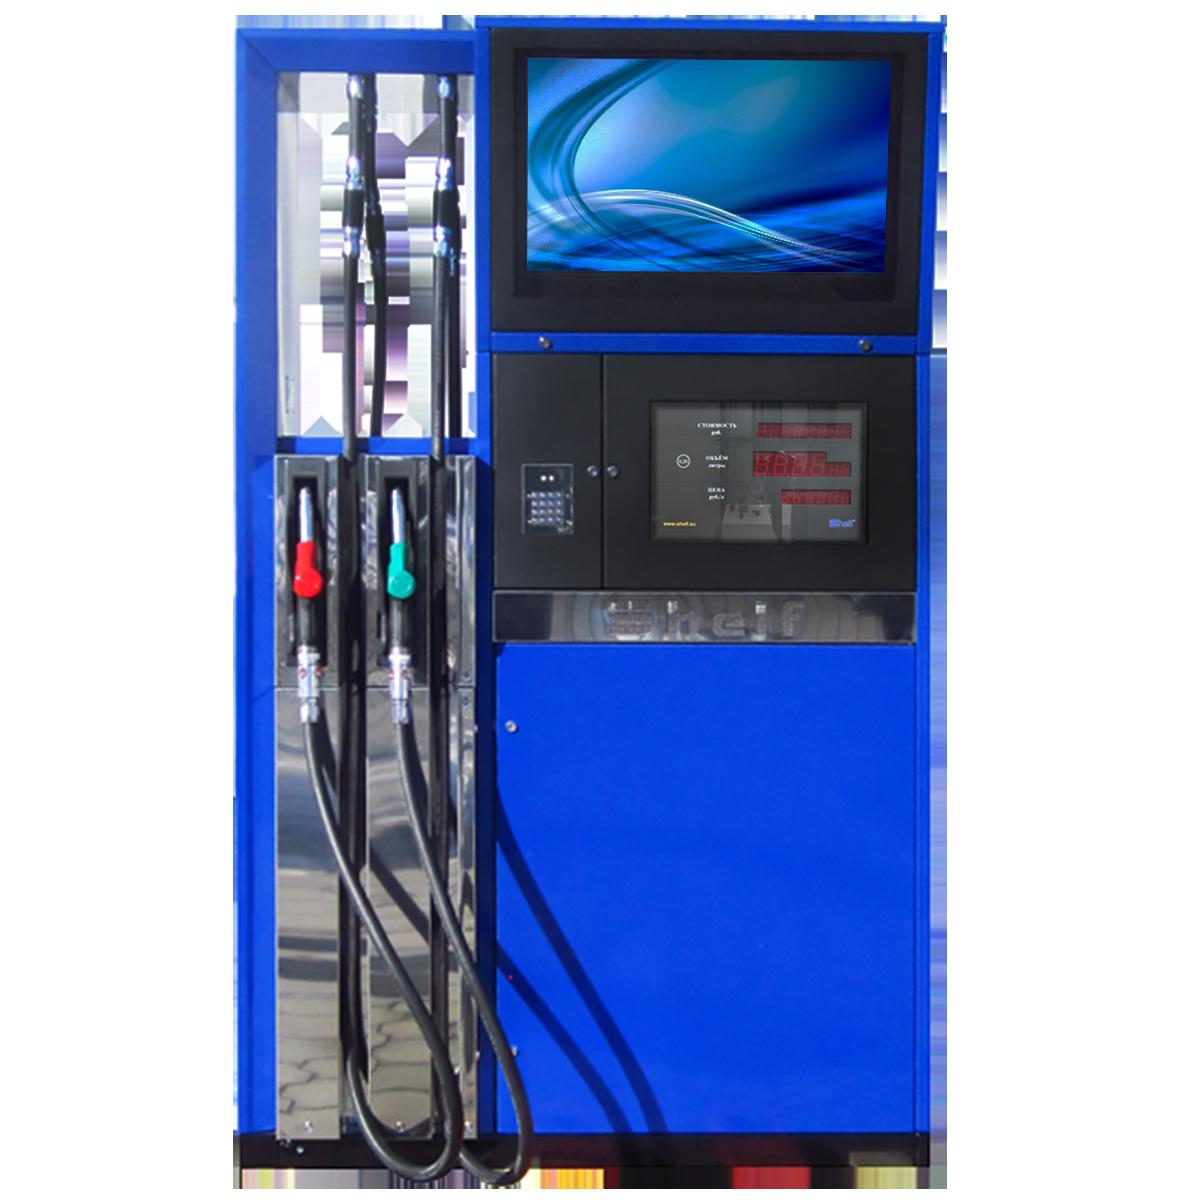 Топливораздаточная колонка серии 300-2S